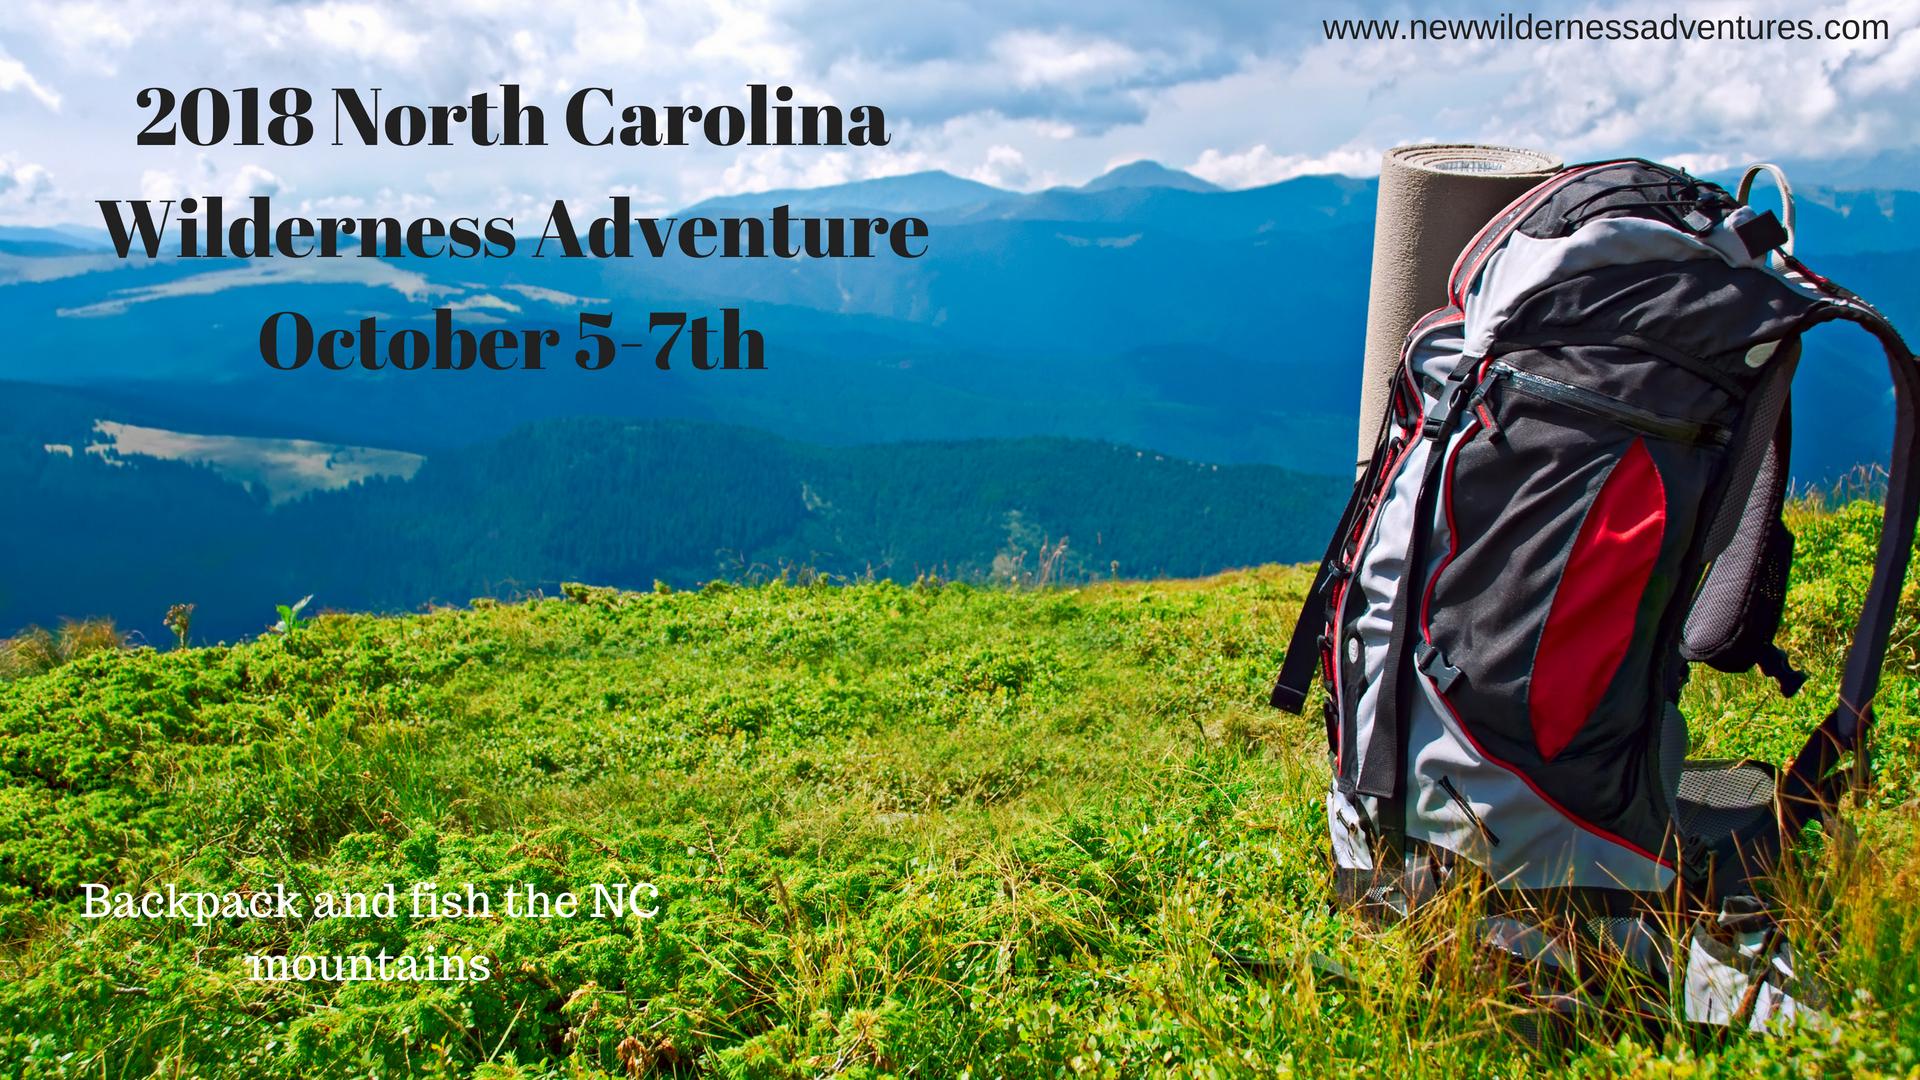 2018 north carolina wilderness adventure october 5 7th